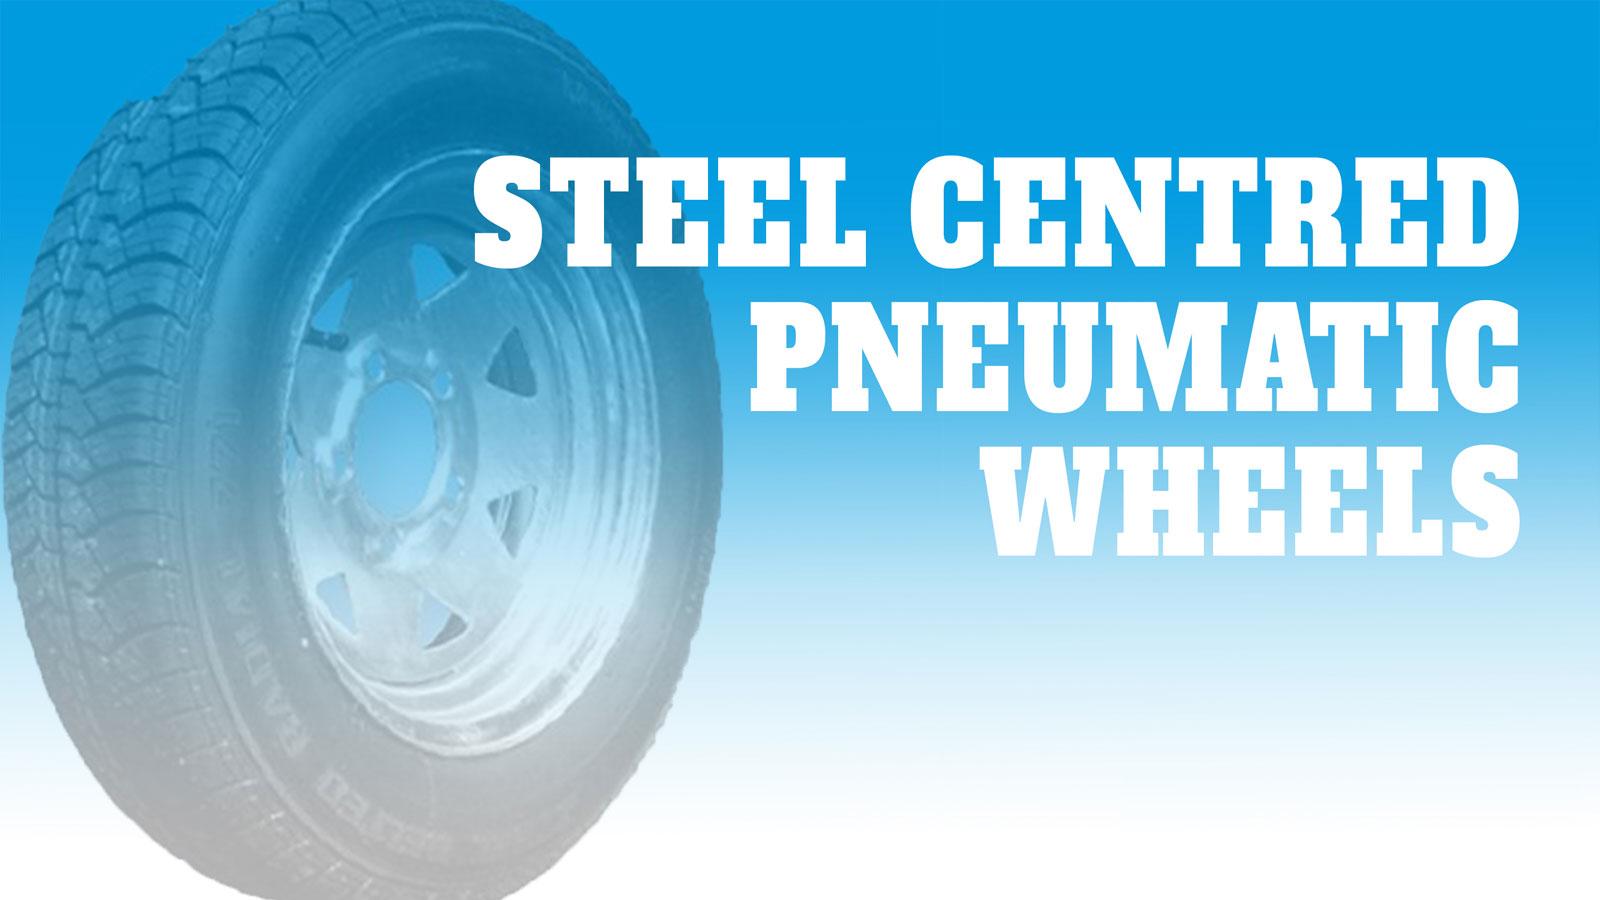 Wheels-Steel-Centred-Pneumatic